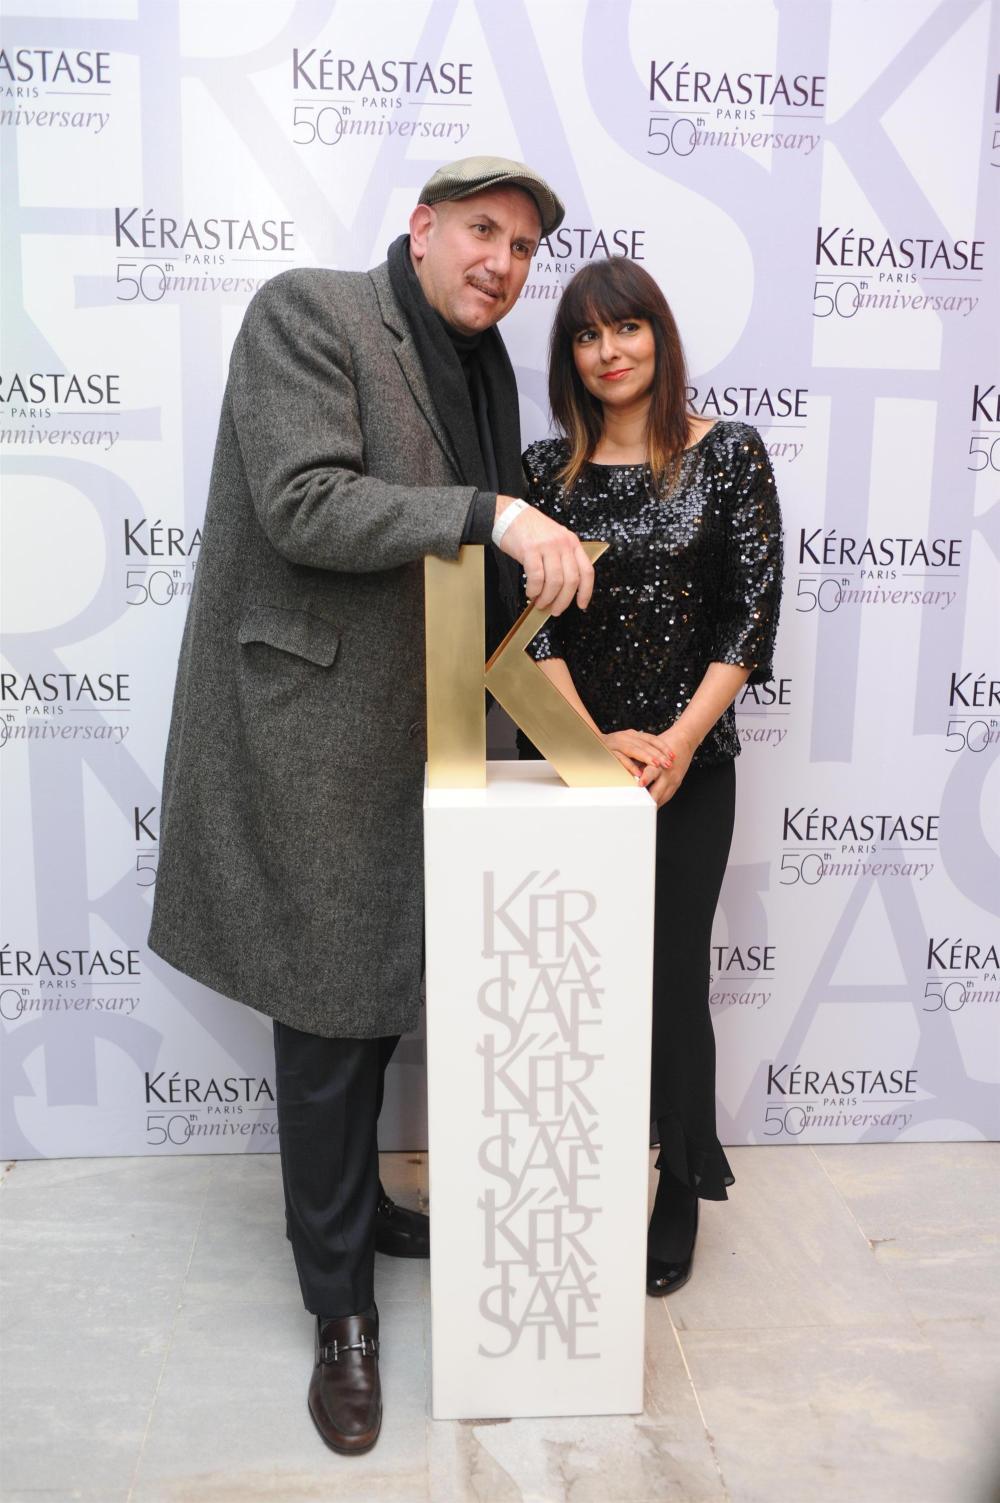 Dimitri ftrom Rossanno Ferretti with Smira Bakshi